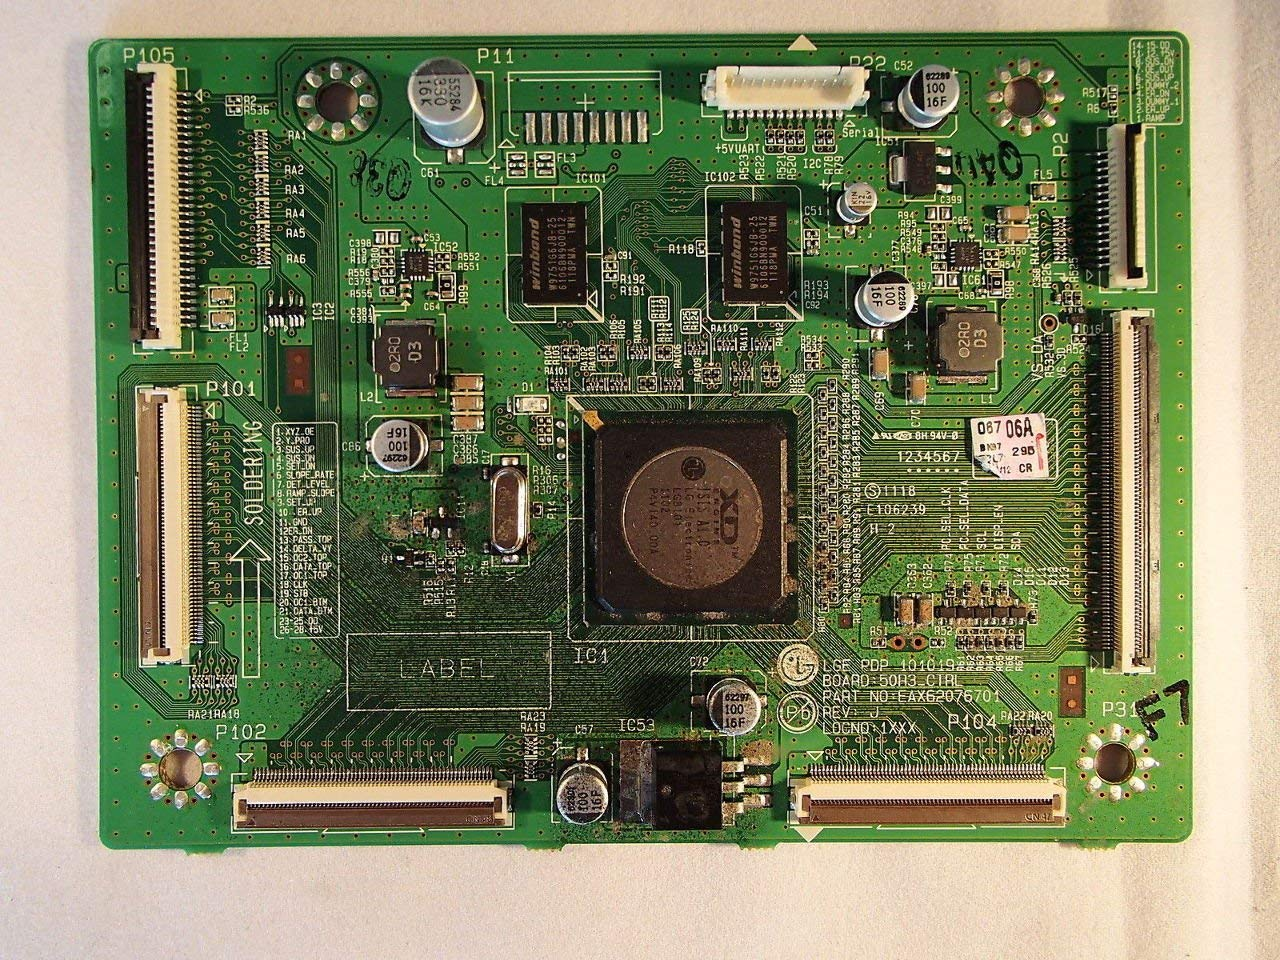 "50"" 50PV450-UA 50PV220-UA EBR71727804 Plasma Main Logic Control Board Unit"